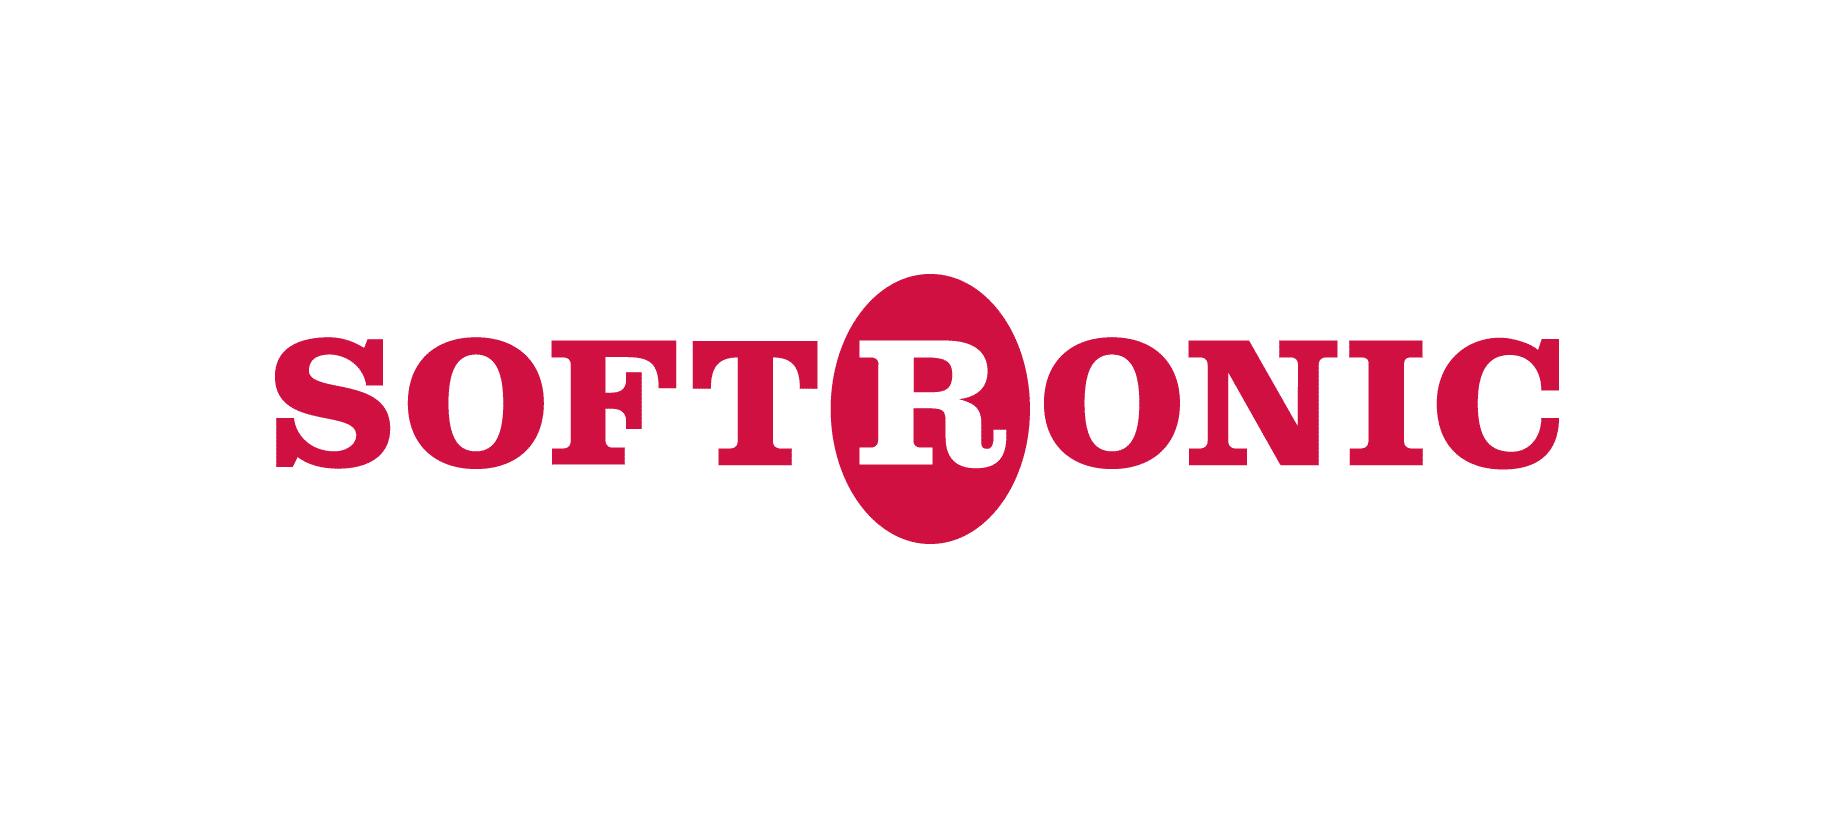 softronic-logga i png-format